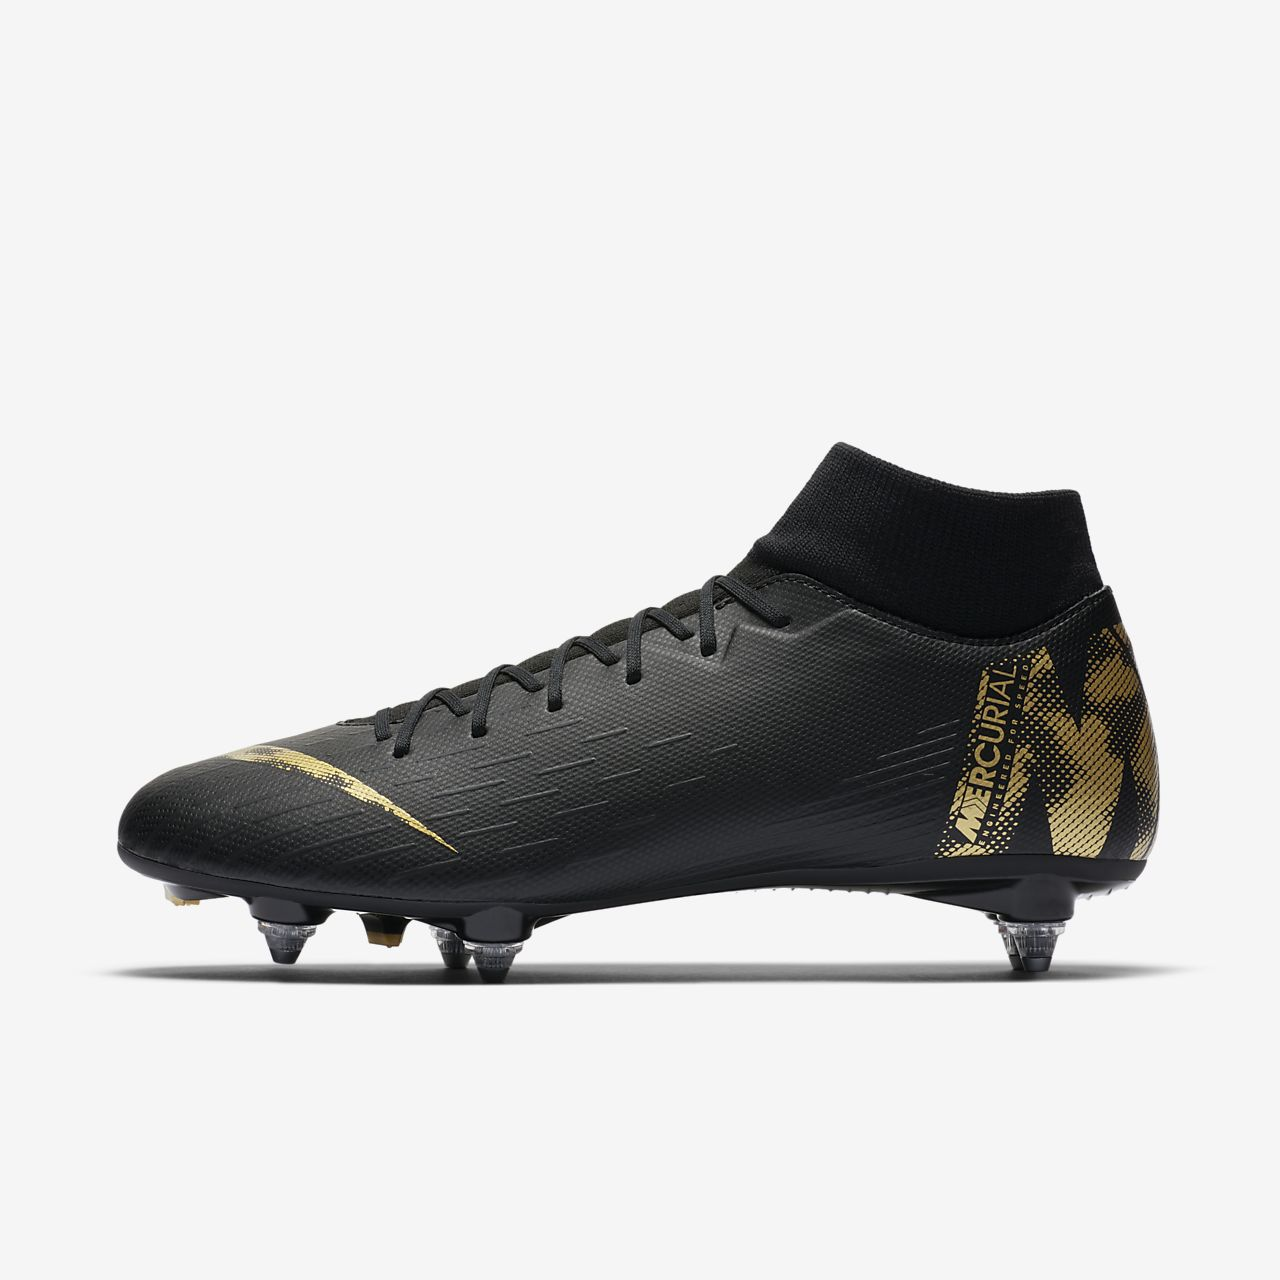 Nike Mercurial Superfly VI Academy SG-PRO Botes de futbol per a terreny tou